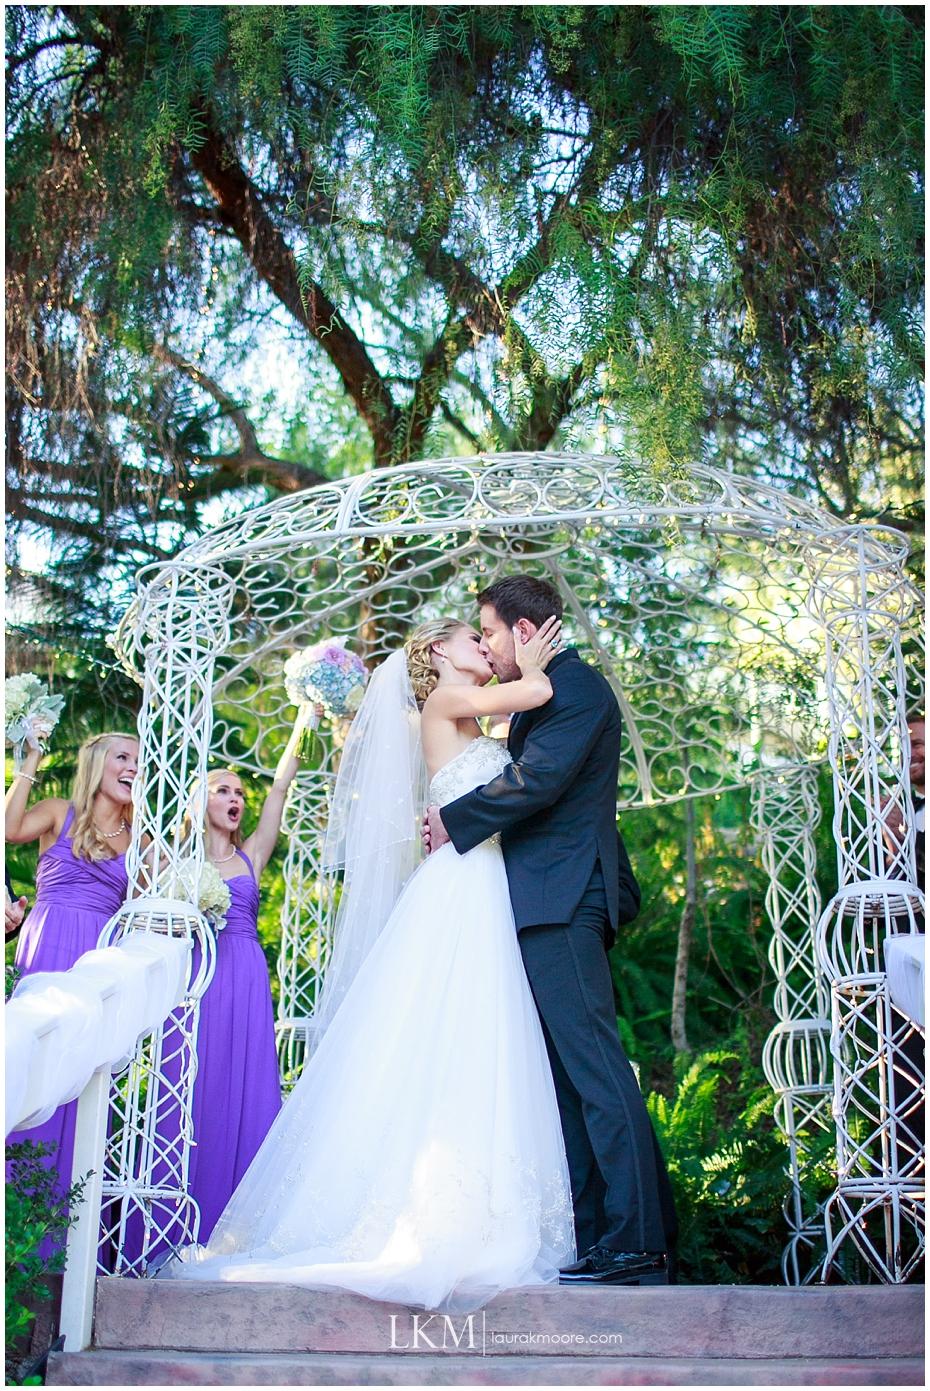 Kristen-Dalton-Celebrity-Wedding-Photography-The-Vineyards-Simi-Valley_0096.jpg